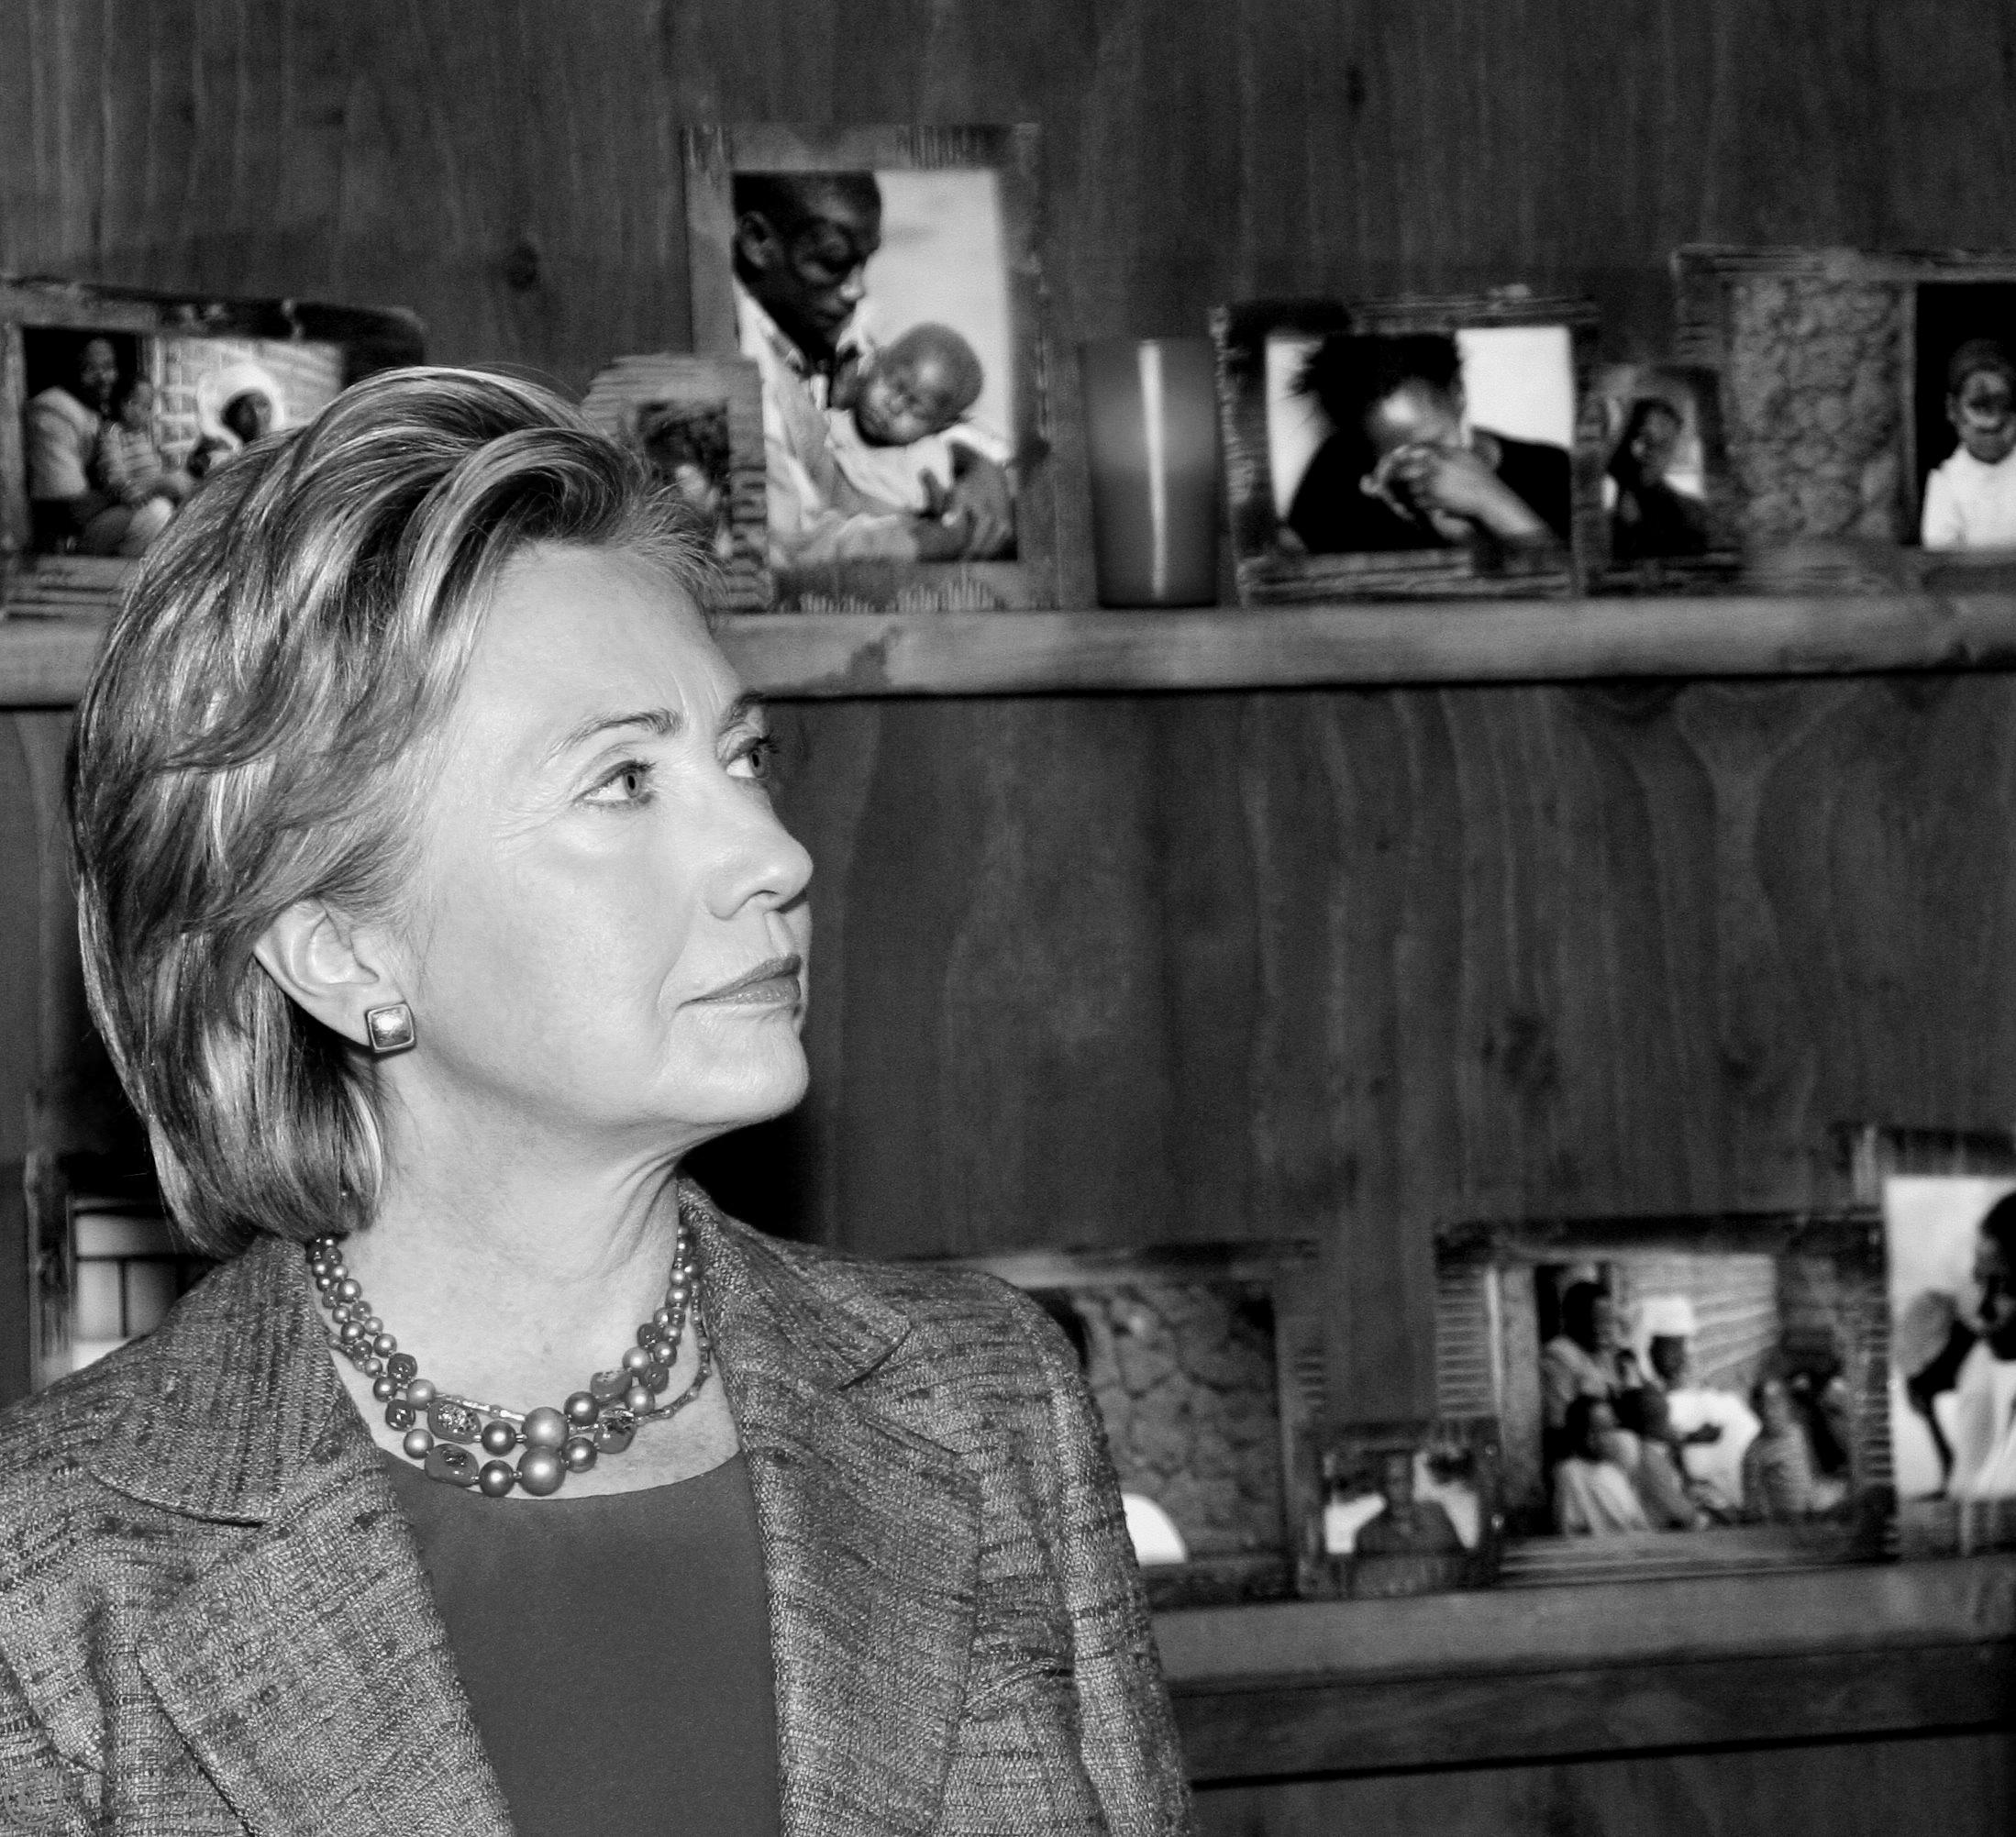 HillaryClinton_profile.jpg